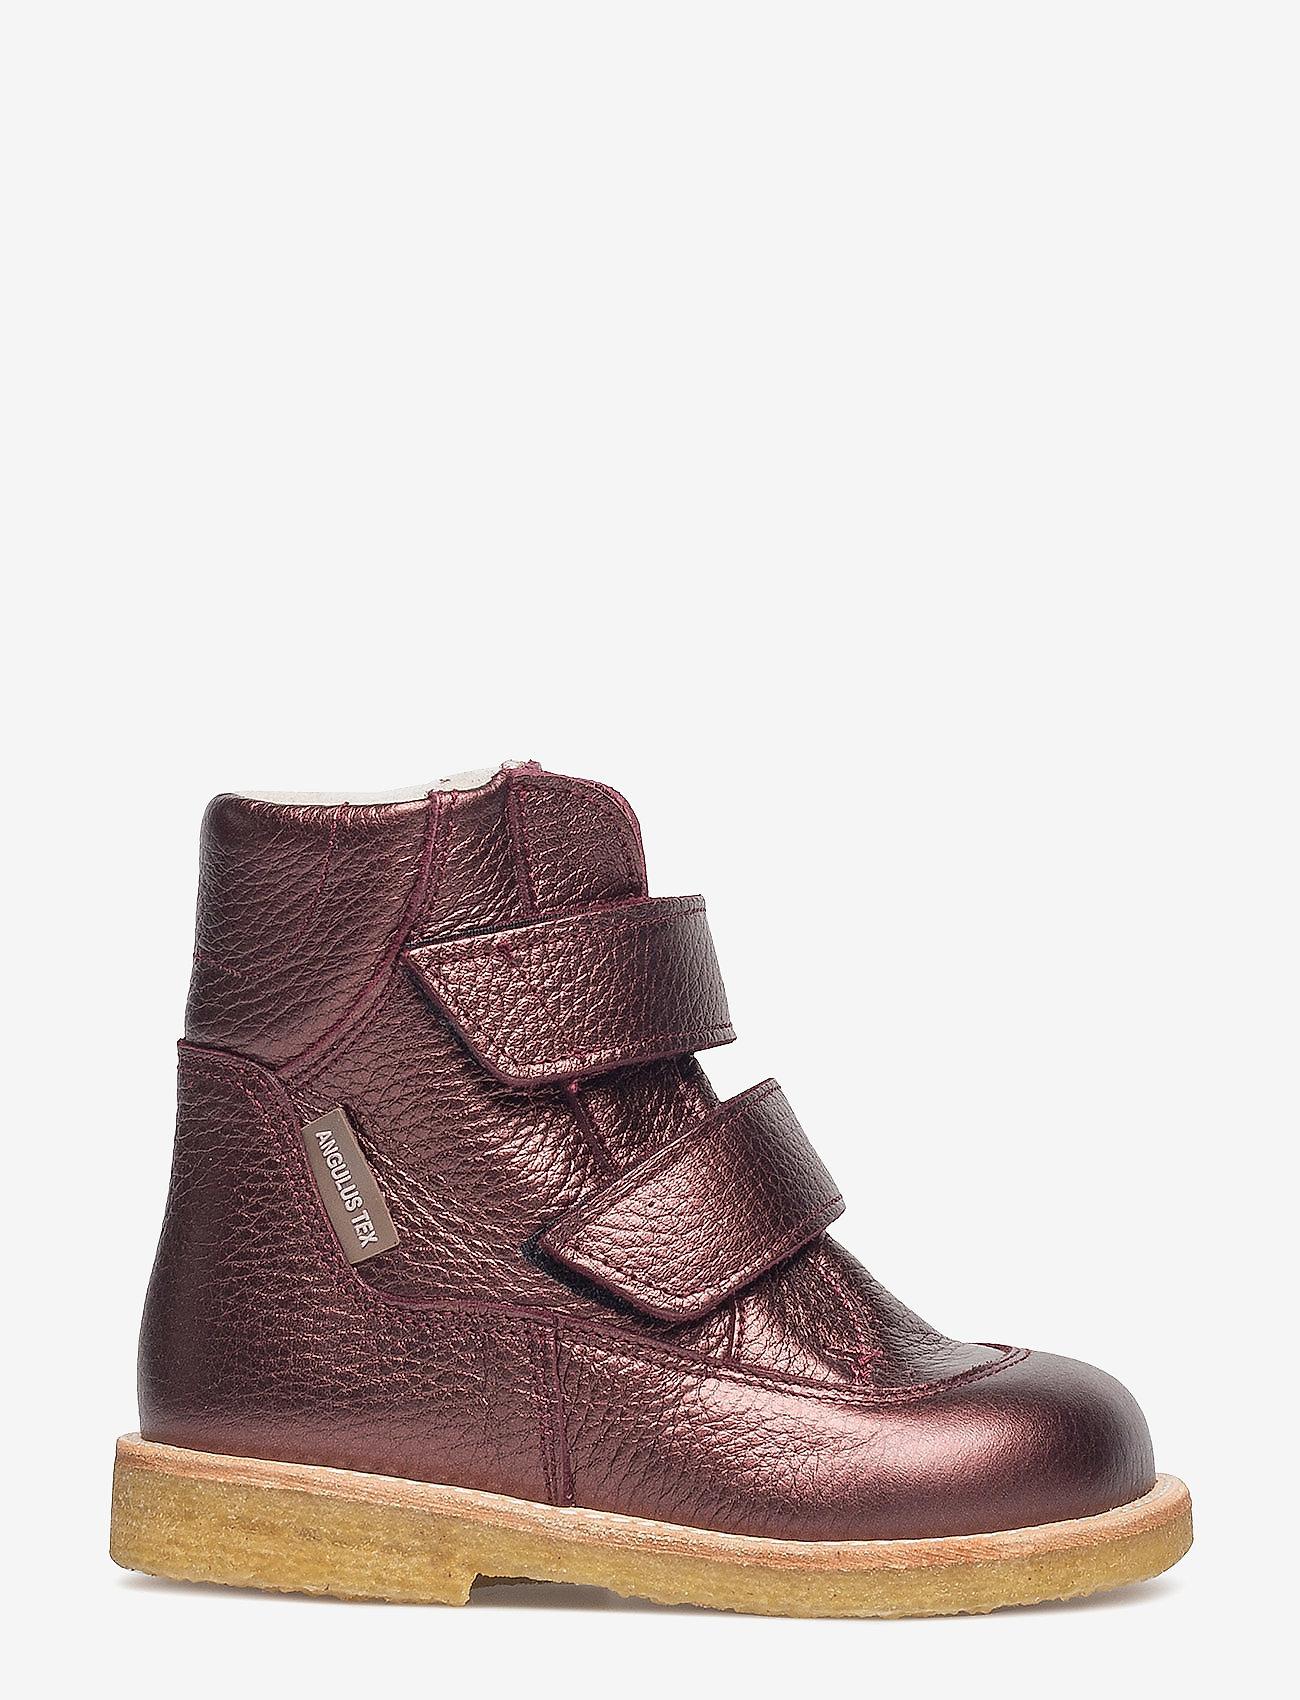 ANGULUS - Boots - flat - with velcro - stövlar & kängor - 1536 bordeaux shine - 1